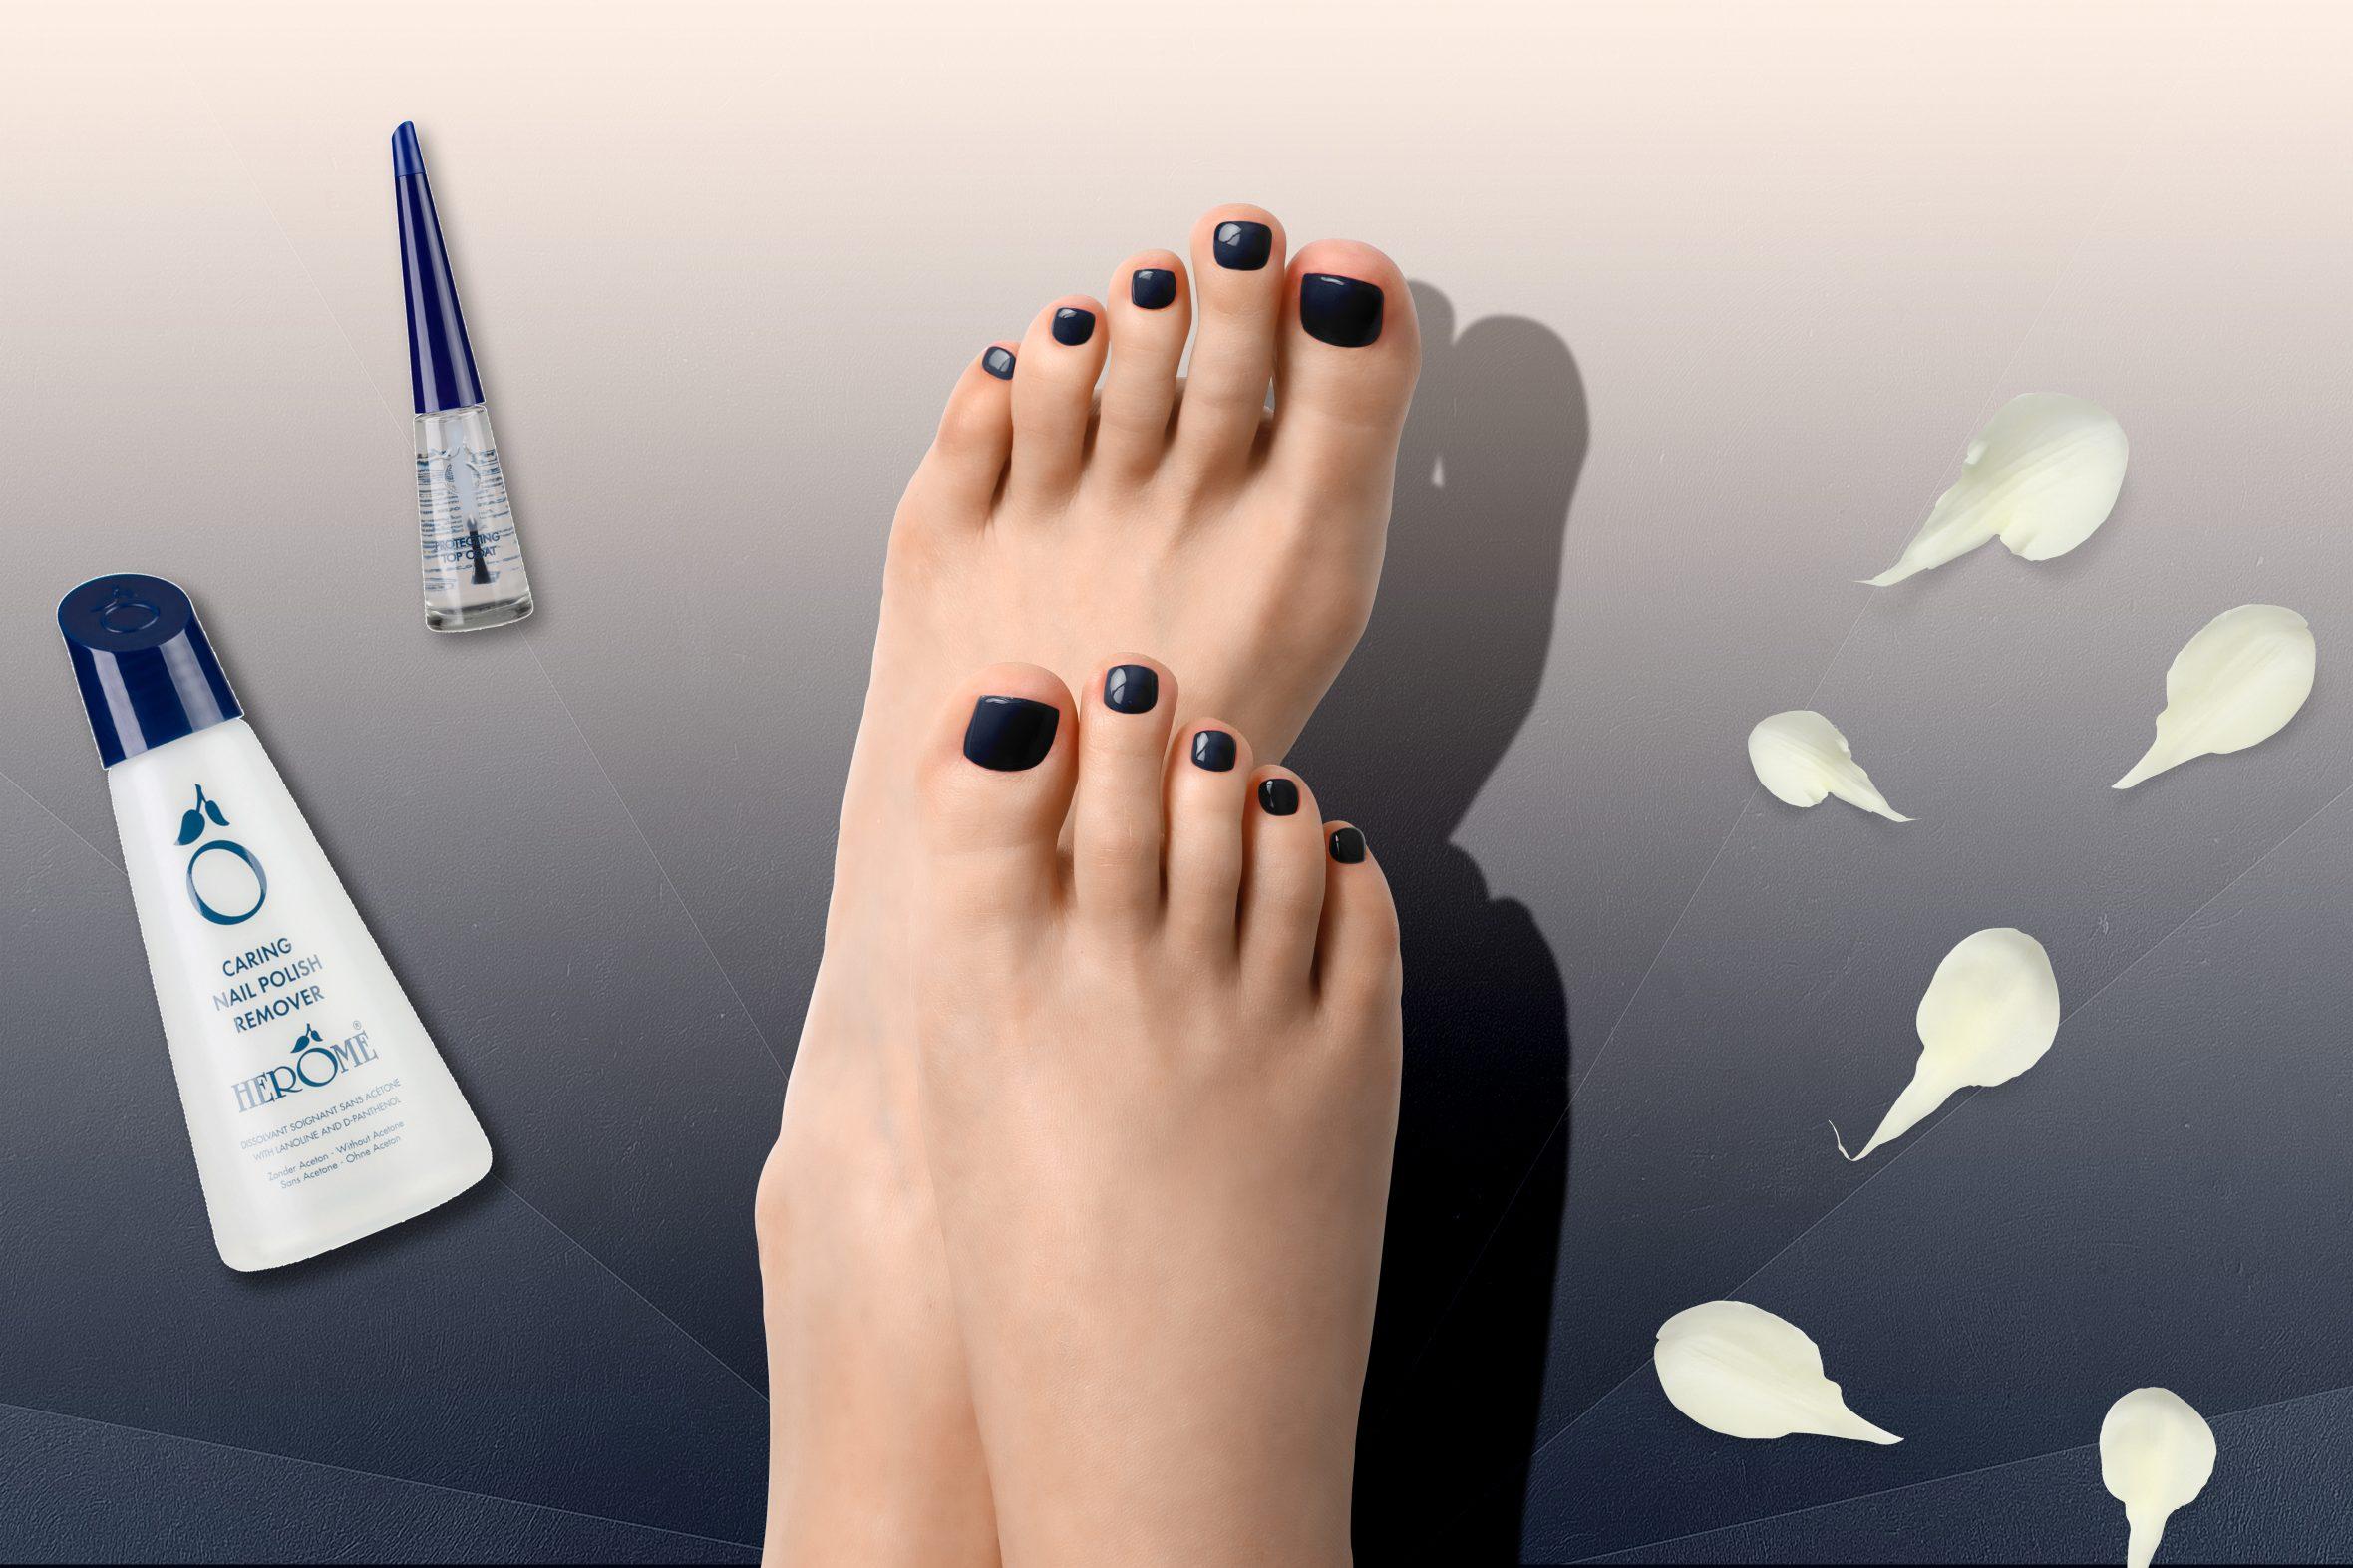 donkerblauwe nagellak van Herôme voor je manicure of pedicure